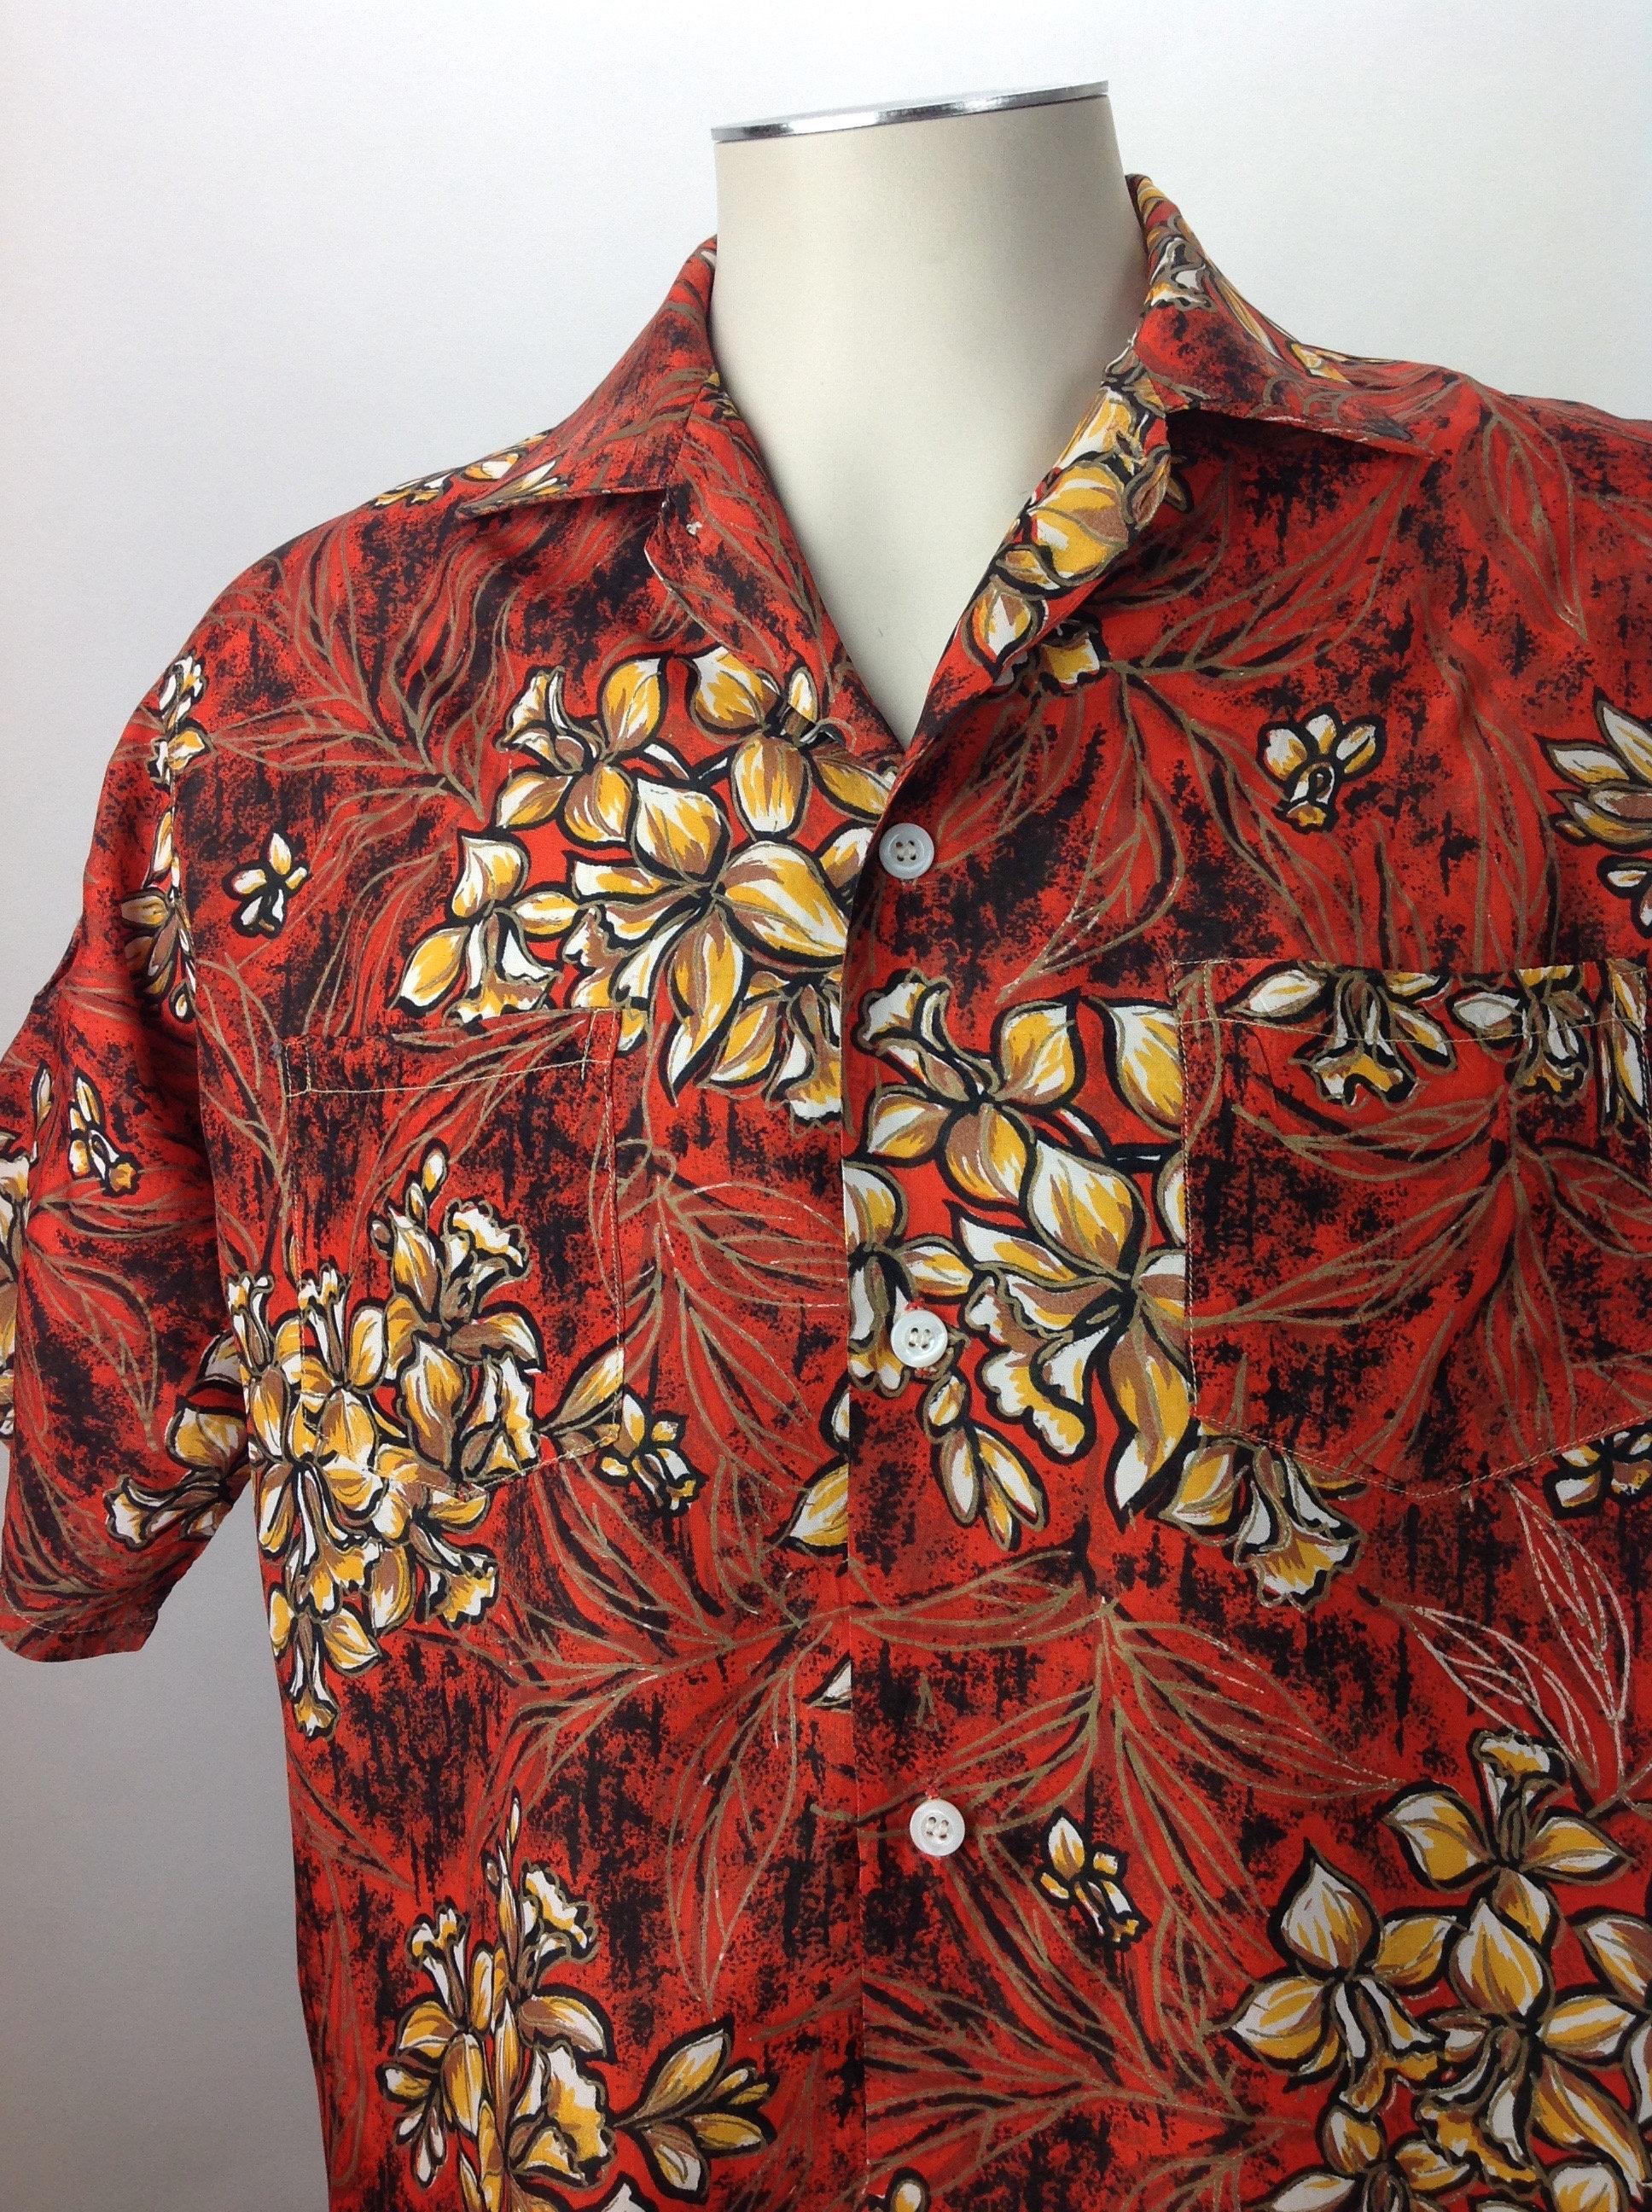 1950s Mens Hats | 50s Vintage Men's Hats Vintage 1950s-60s Hawaiian ShirtBy Paradise Isle Rich Colors Rayon - Acetate Blend Mens Size Medium $22.95 AT vintagedancer.com